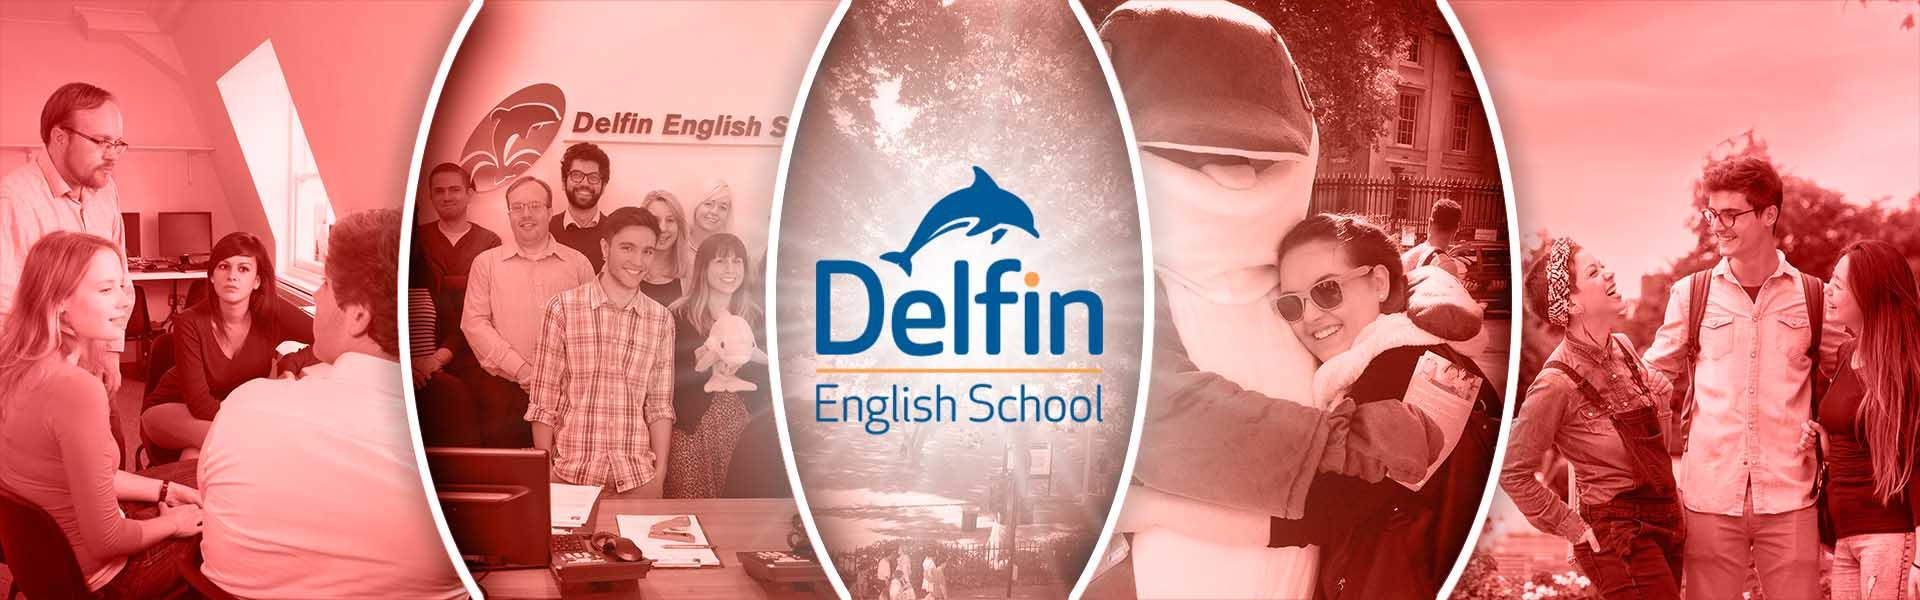 Delfin English School London